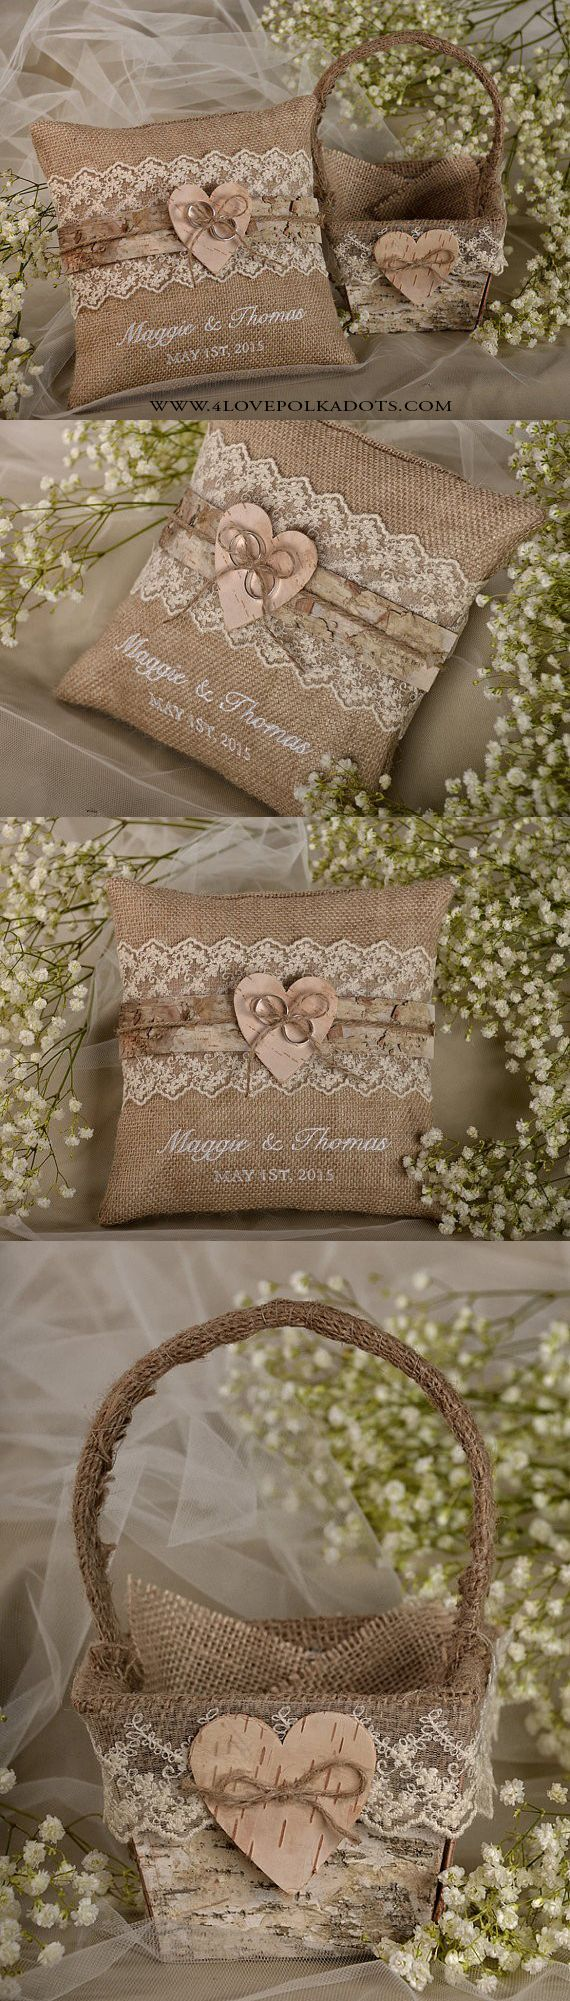 Rustic Wedding Flower Girl Set : Burlap Ring Pillow \u0026 Matching Basket #weddingideas #rustic & Best 25+ Burlap ring pillows ideas on Pinterest | Rustic ring ... pillowsntoast.com